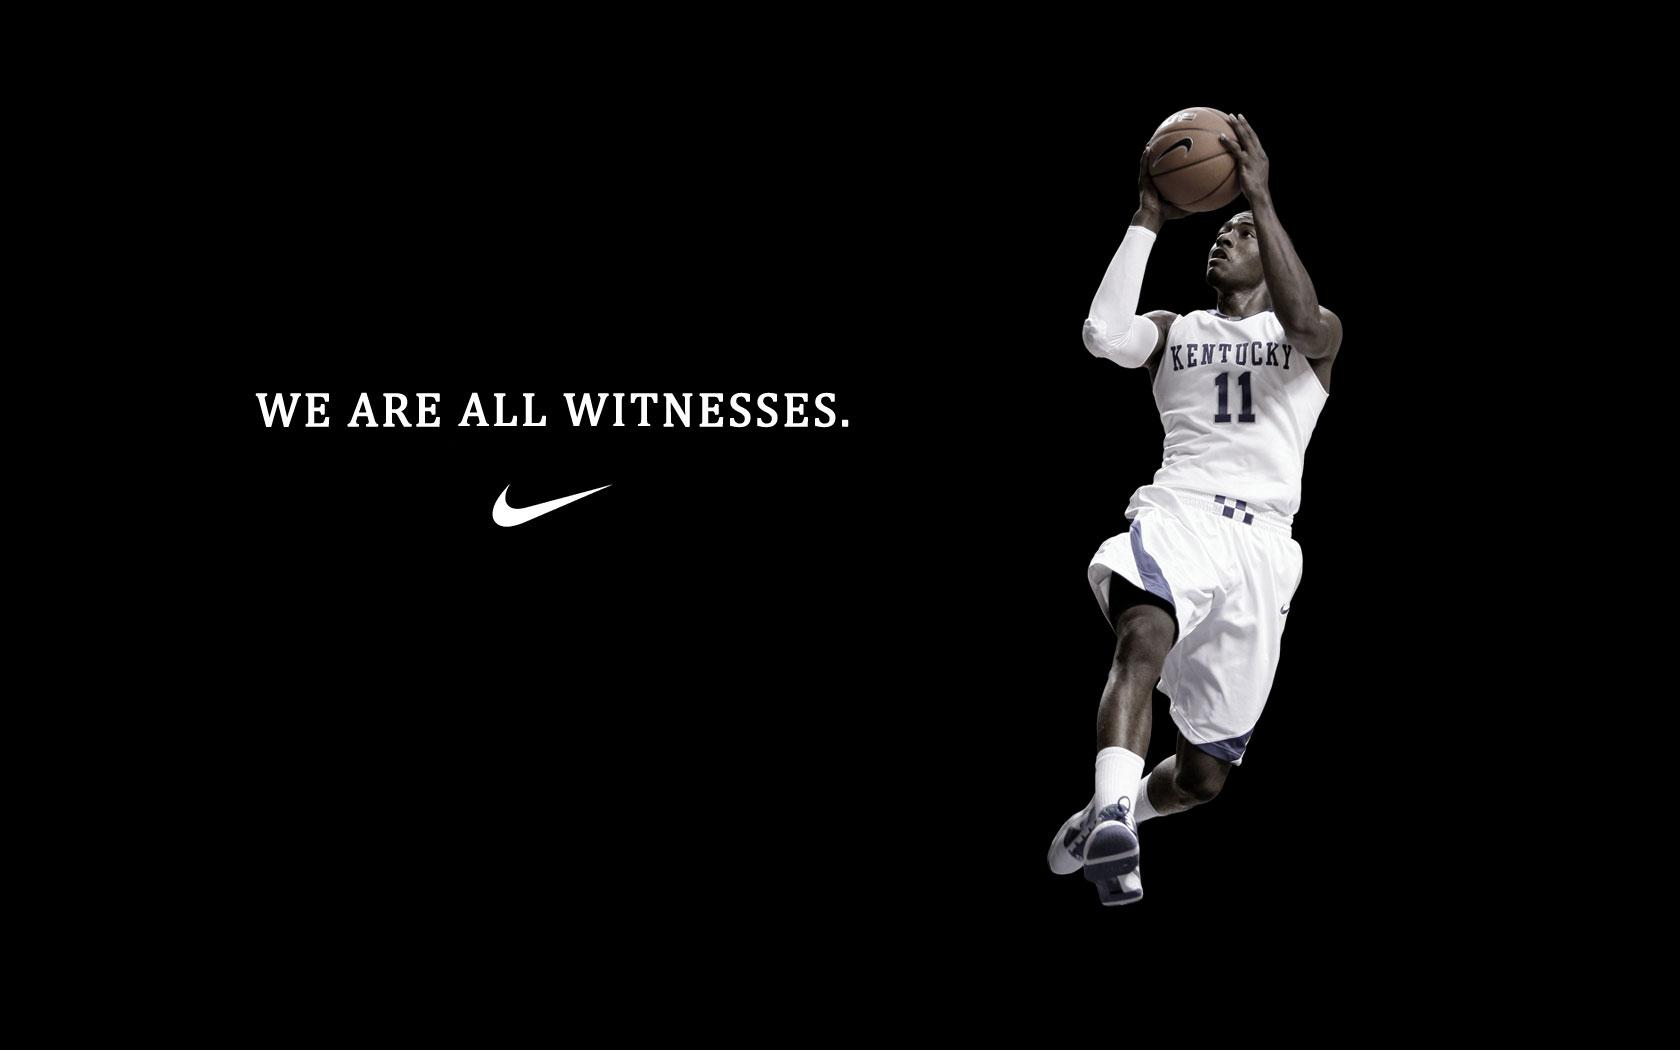 Nike Basketball Wallpaper Themes HD 3054   HD Wallpaper Site 1680x1050